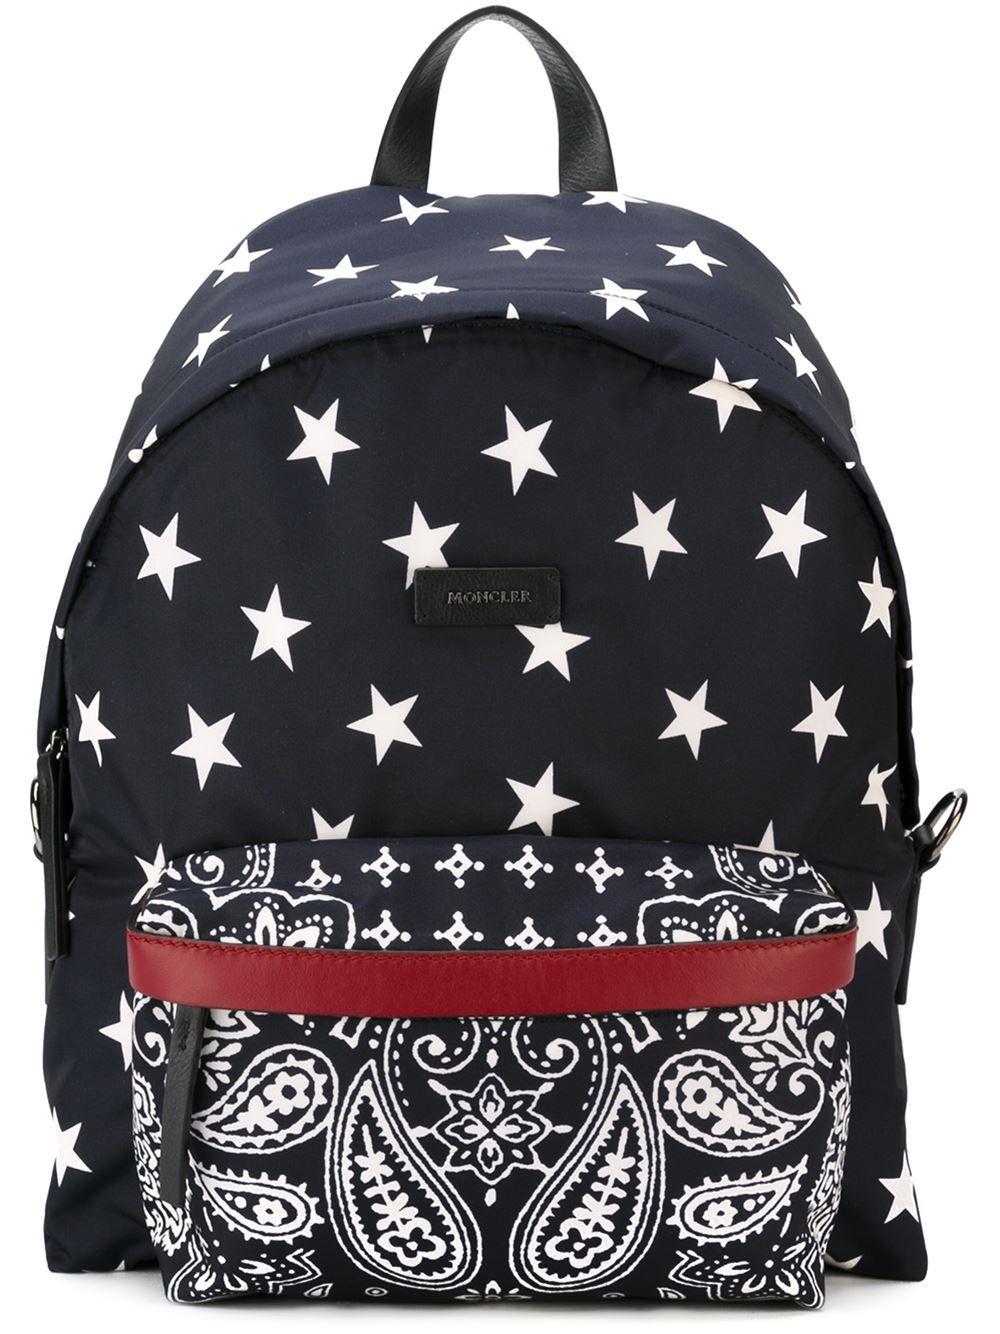 7a091a0f56 moncler  backpack  stars  bandana  cashemeres  newin www.jofre.eu ...